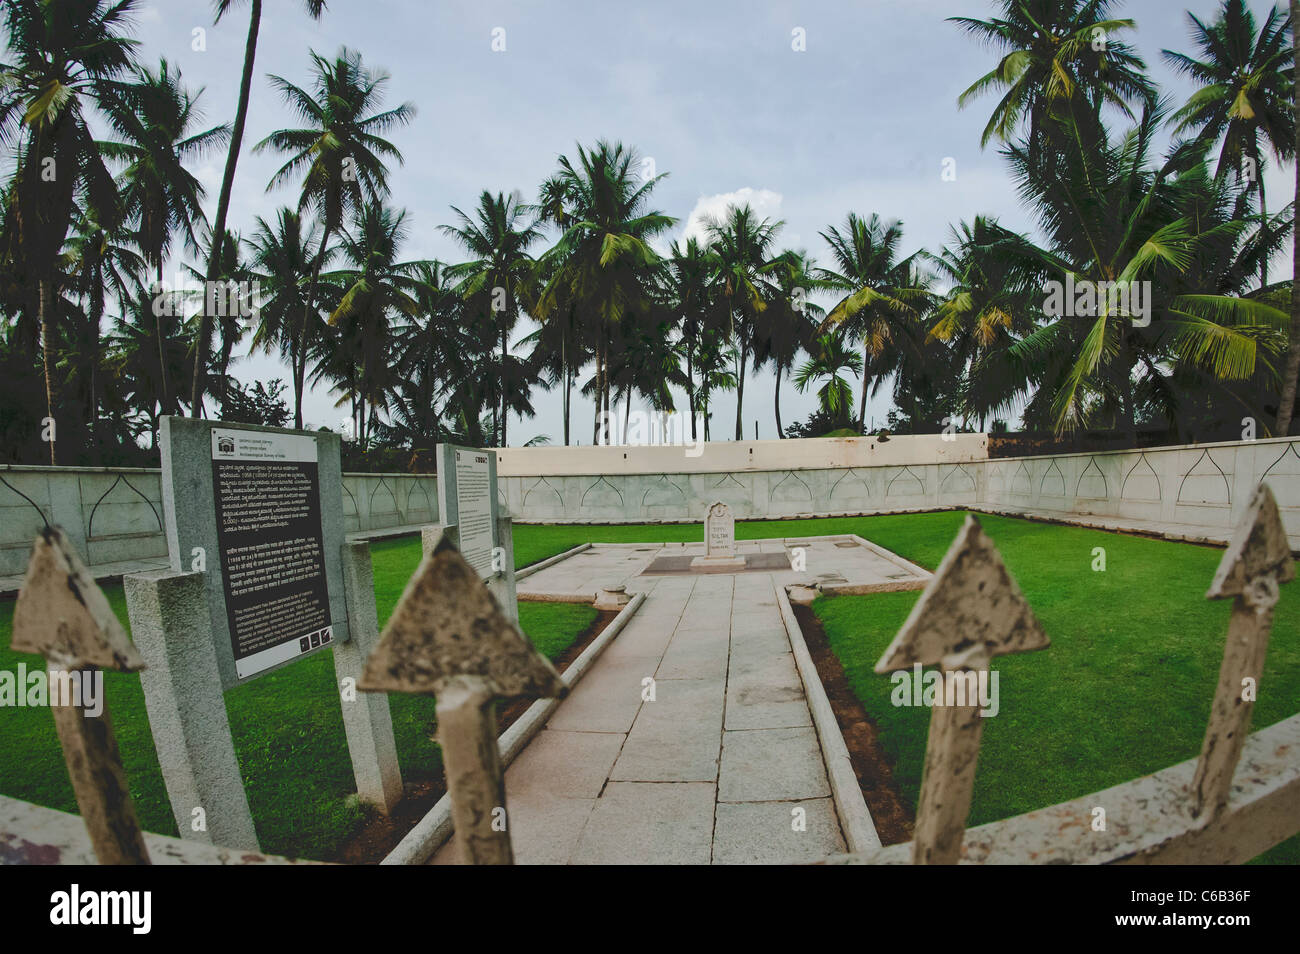 The Memorium in honour of the executed British people at Srirangapatna-Karnatka-India. - Stock Image